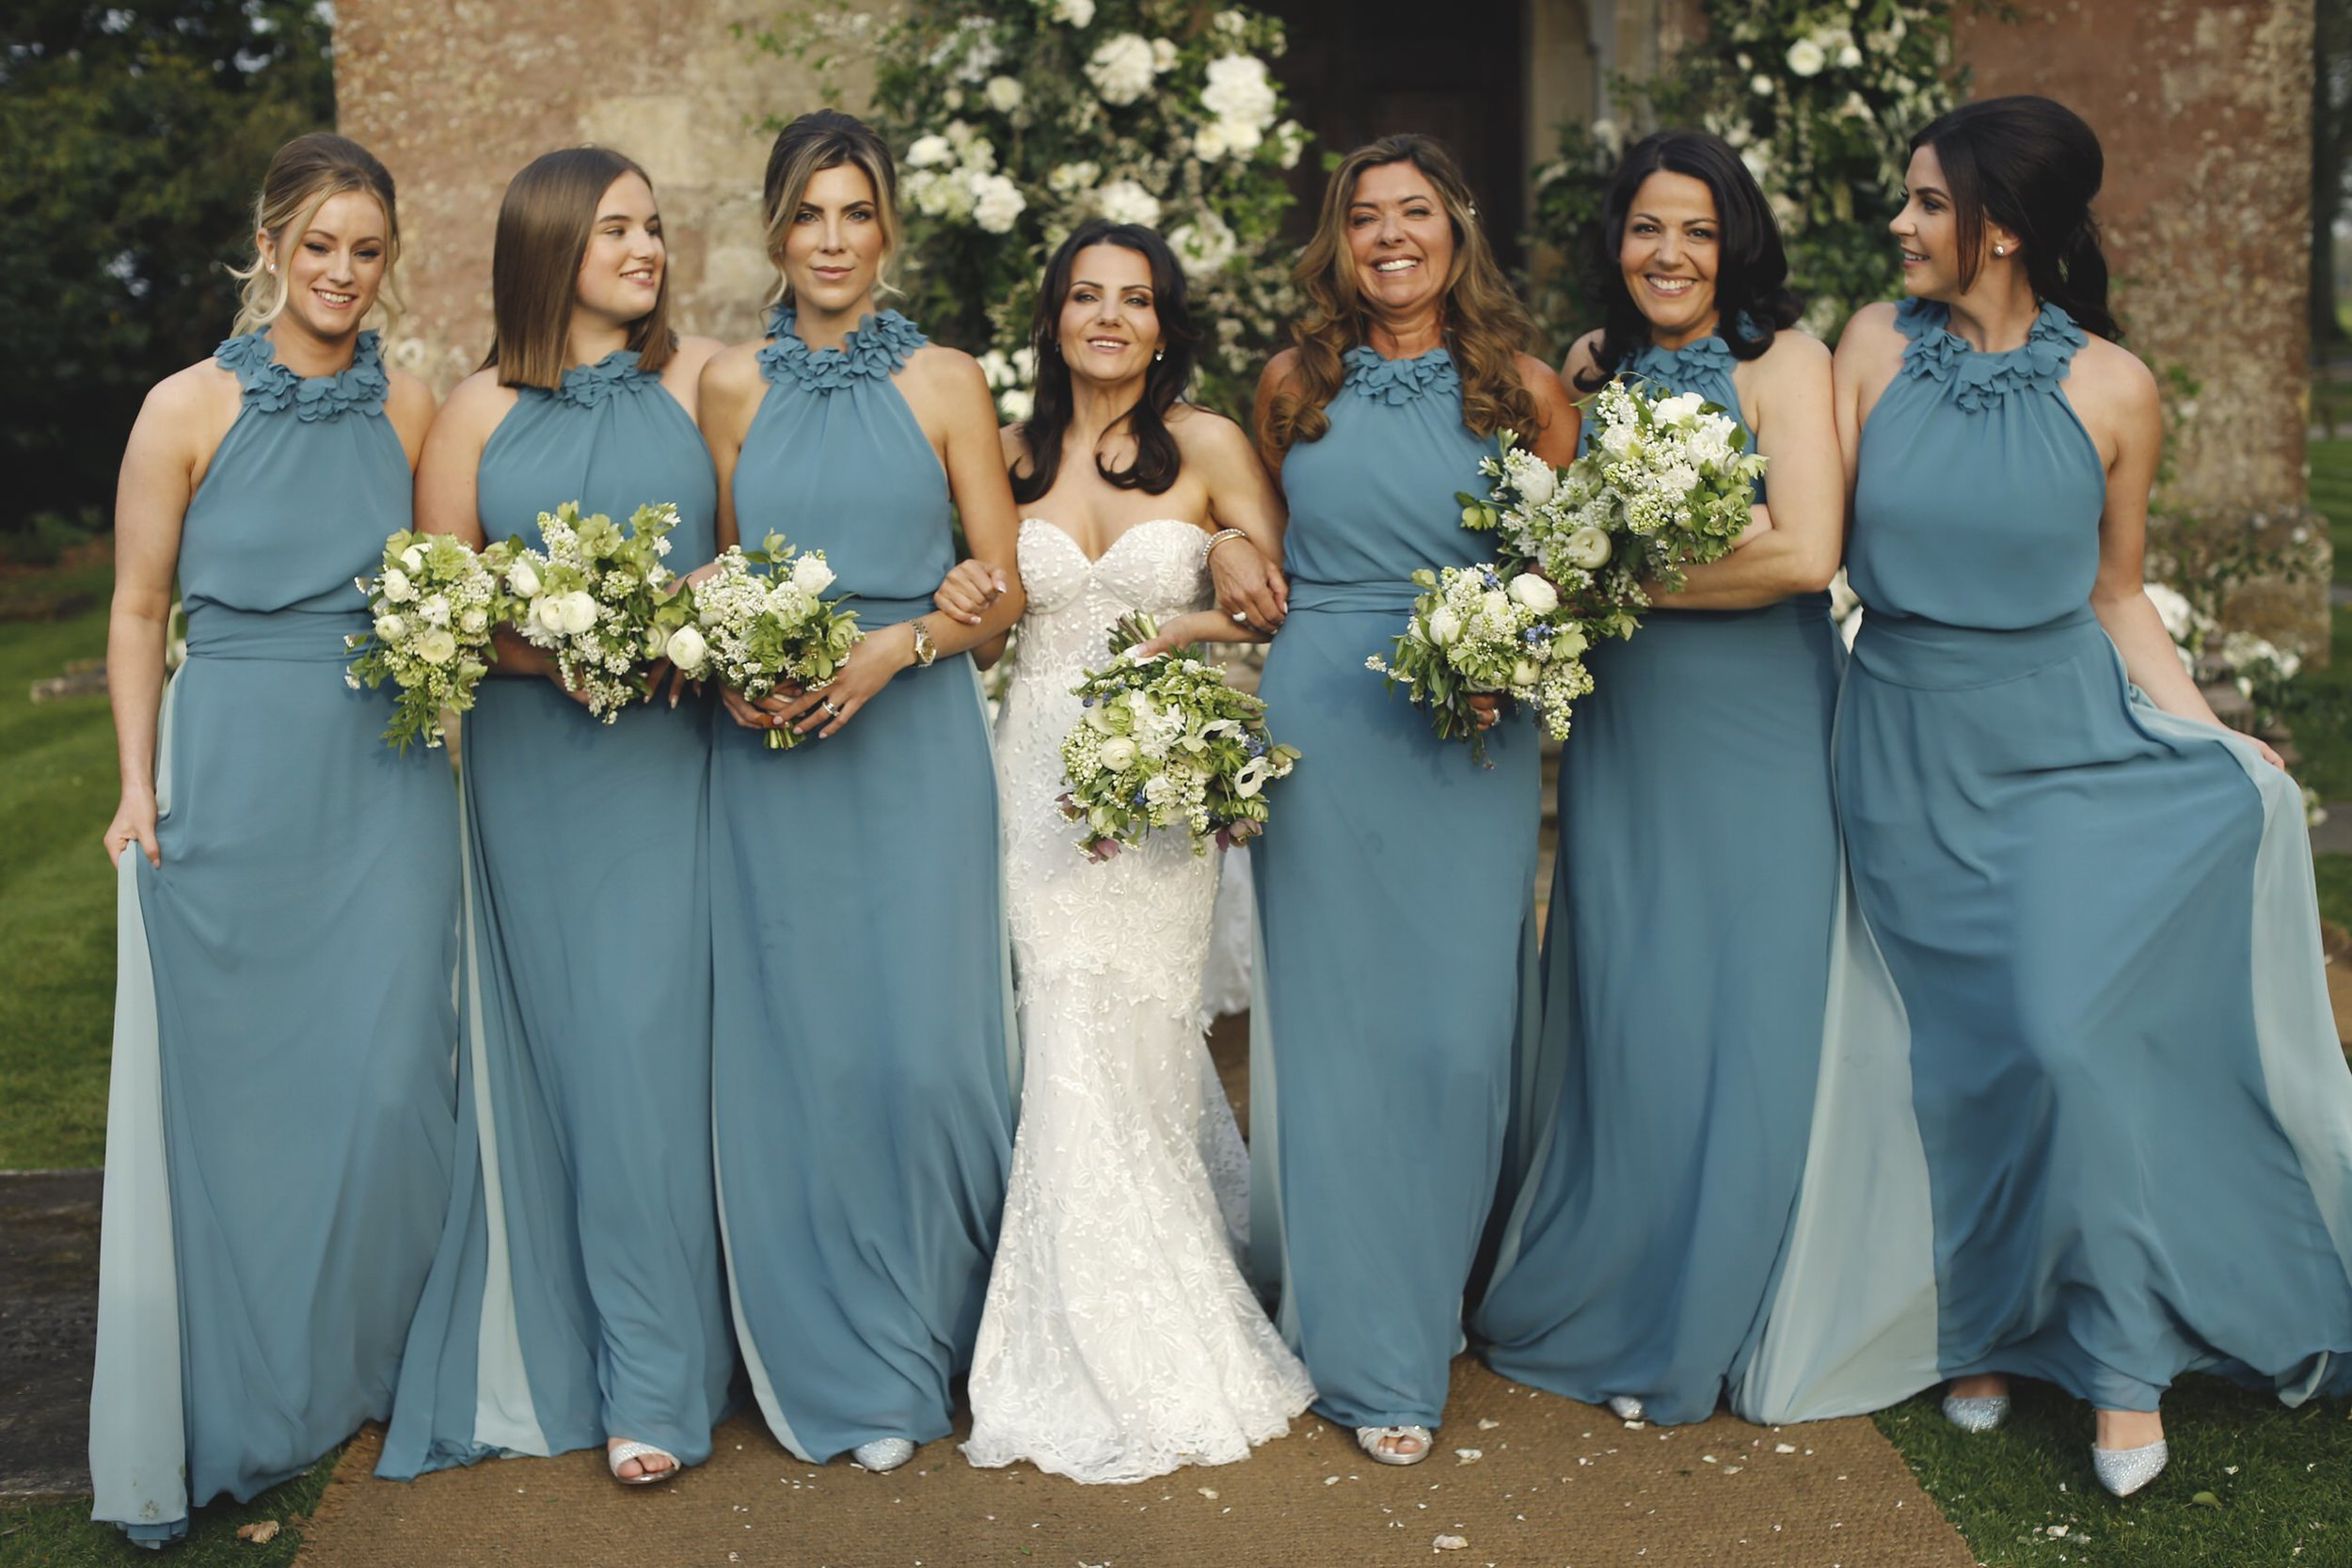 brettharkness-luxury-wedding-photographer-uk_0041.jpg